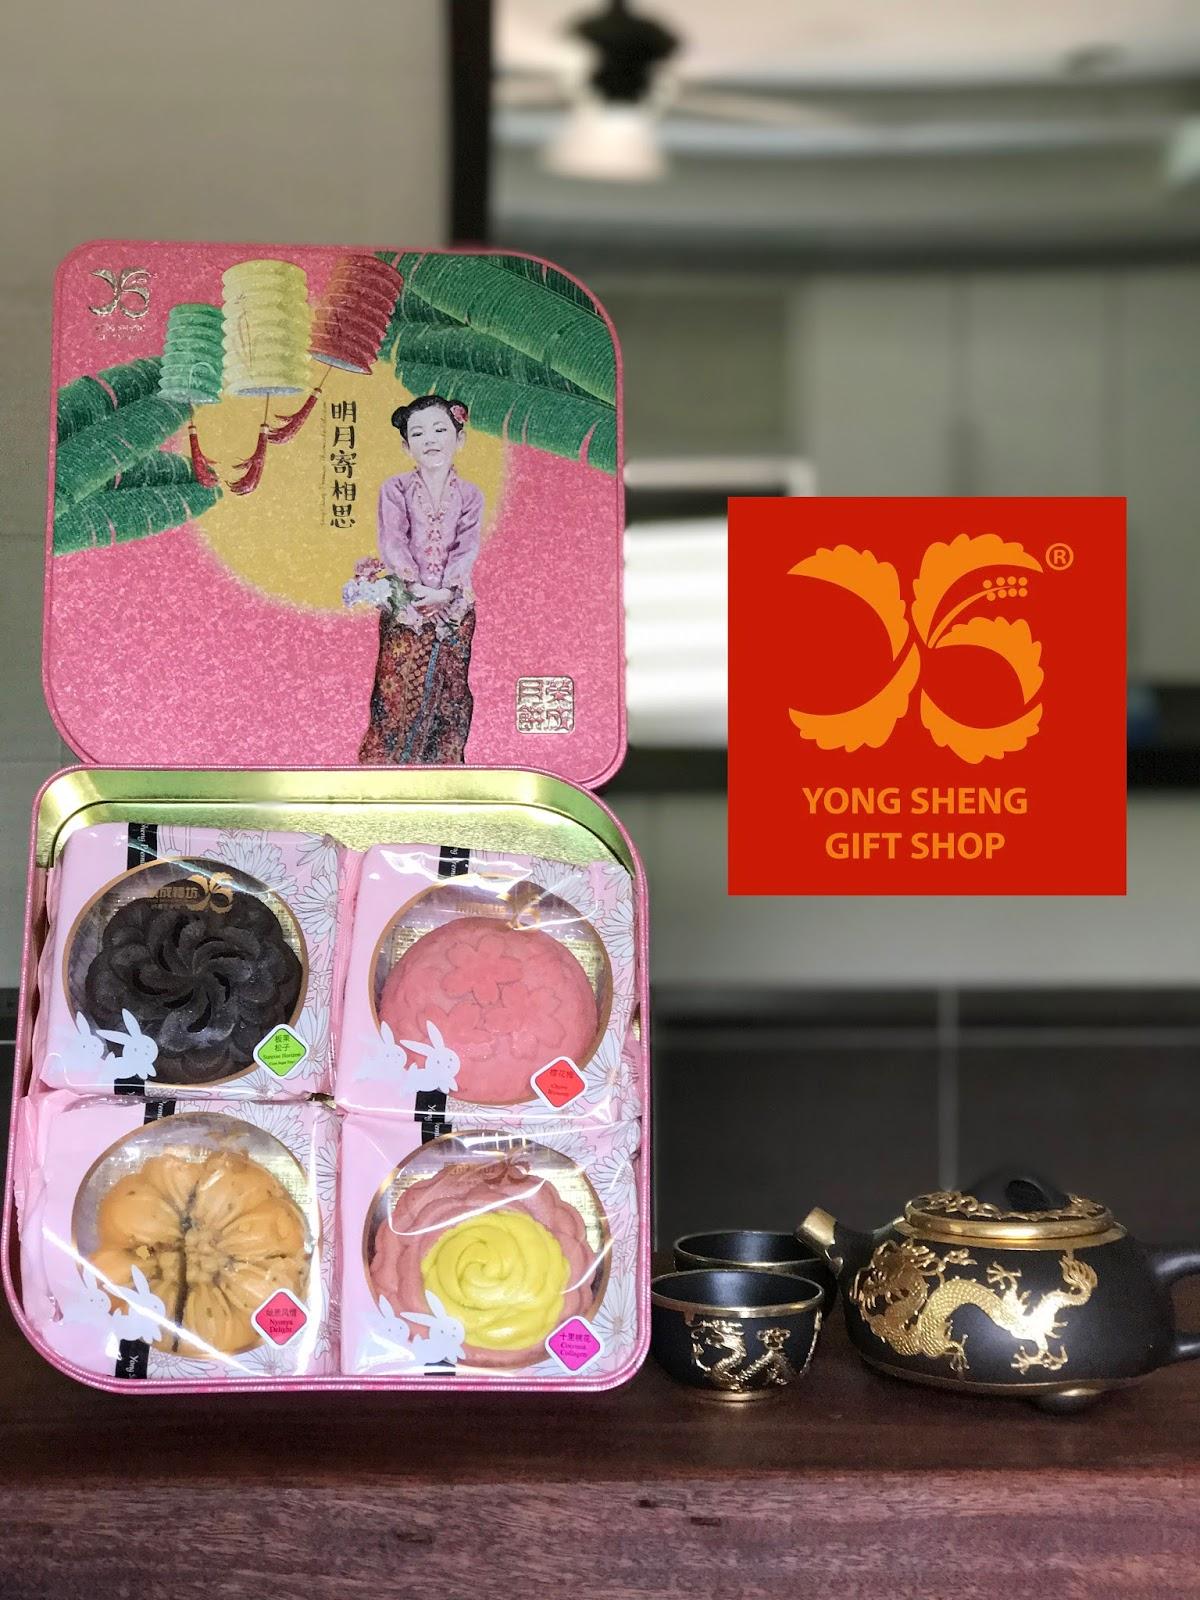 Mid Autumn Festival - Mooncake Gift Box by Yong Sheng Gift Shop